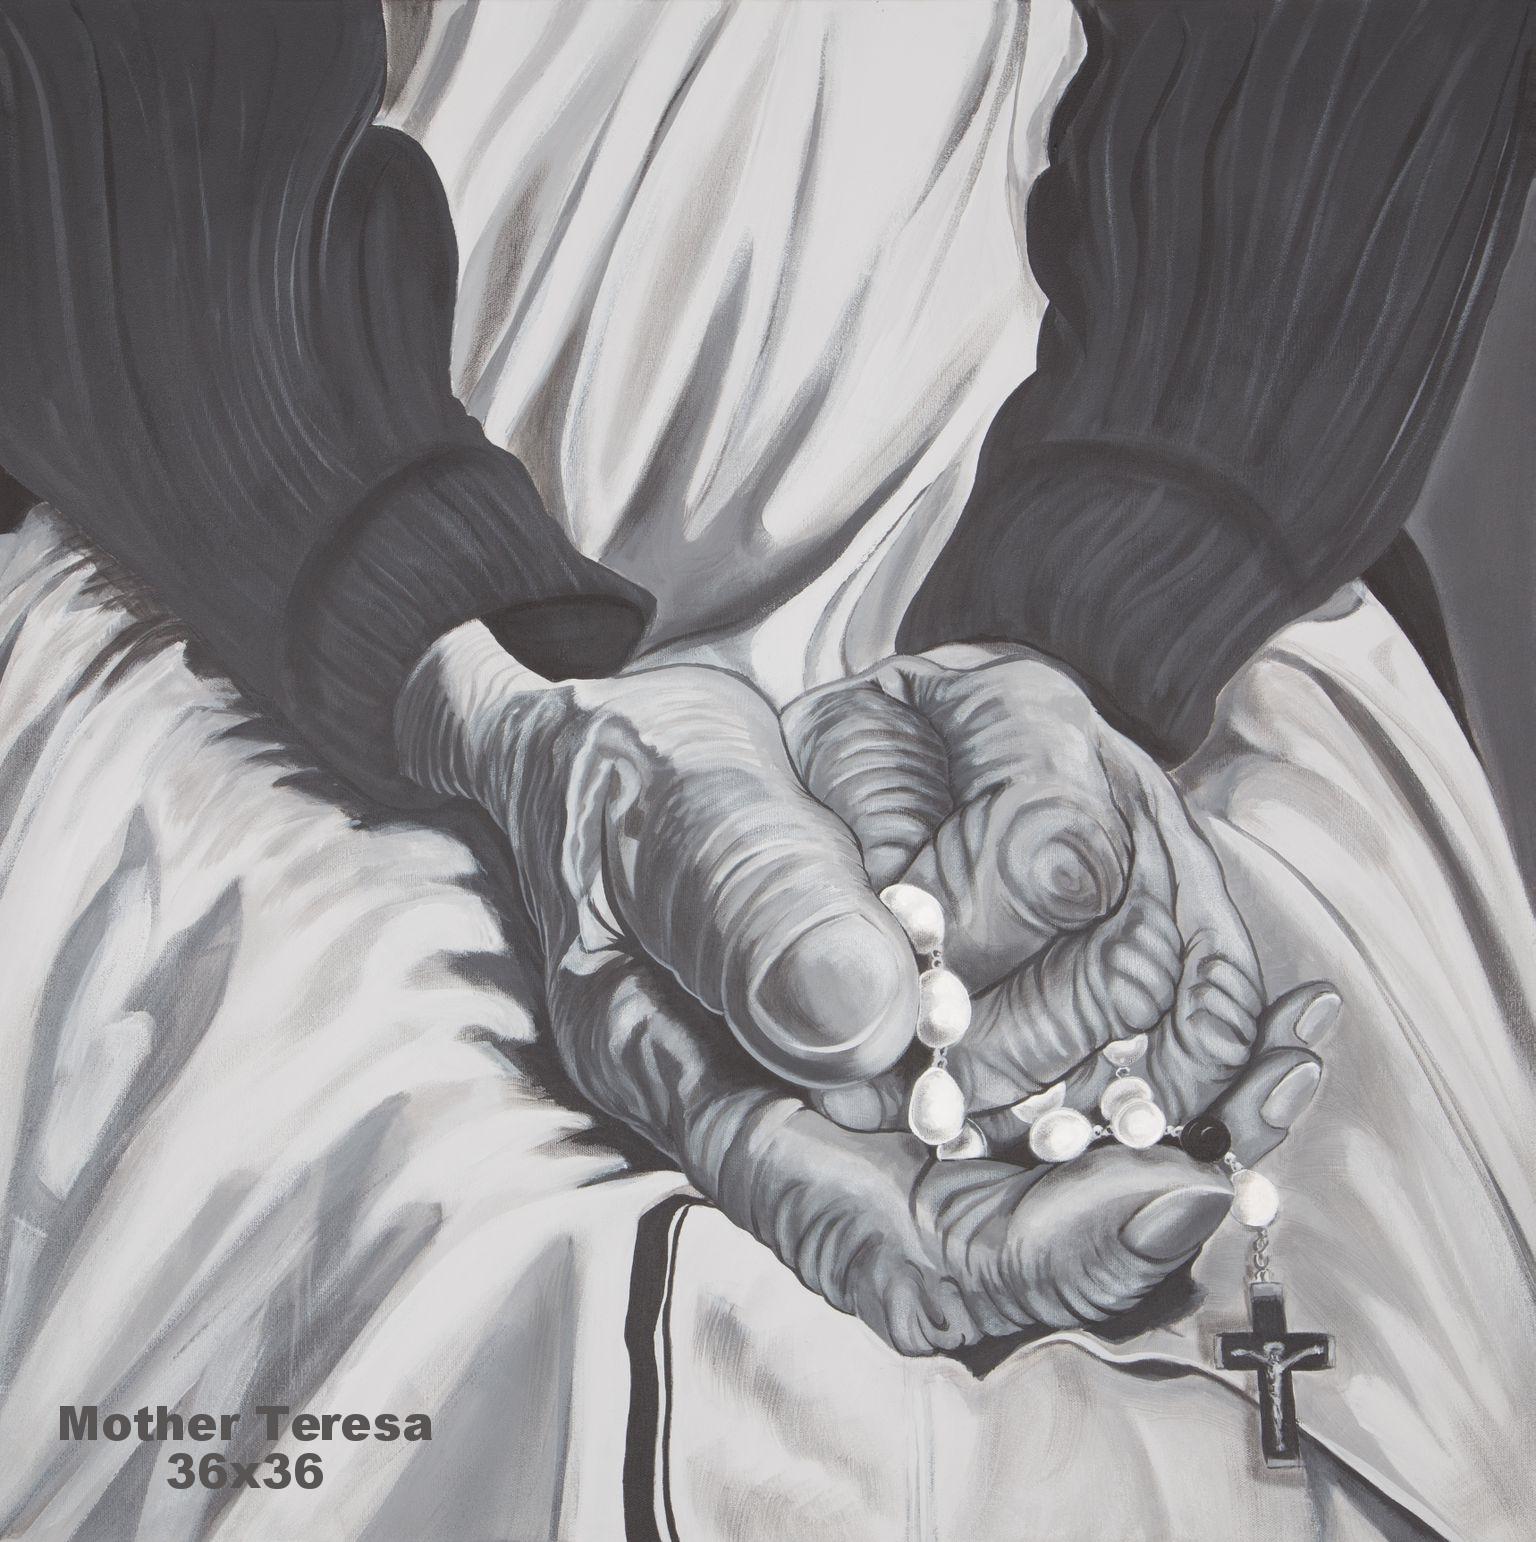 Mother Teresa 30 x 30.jpeg